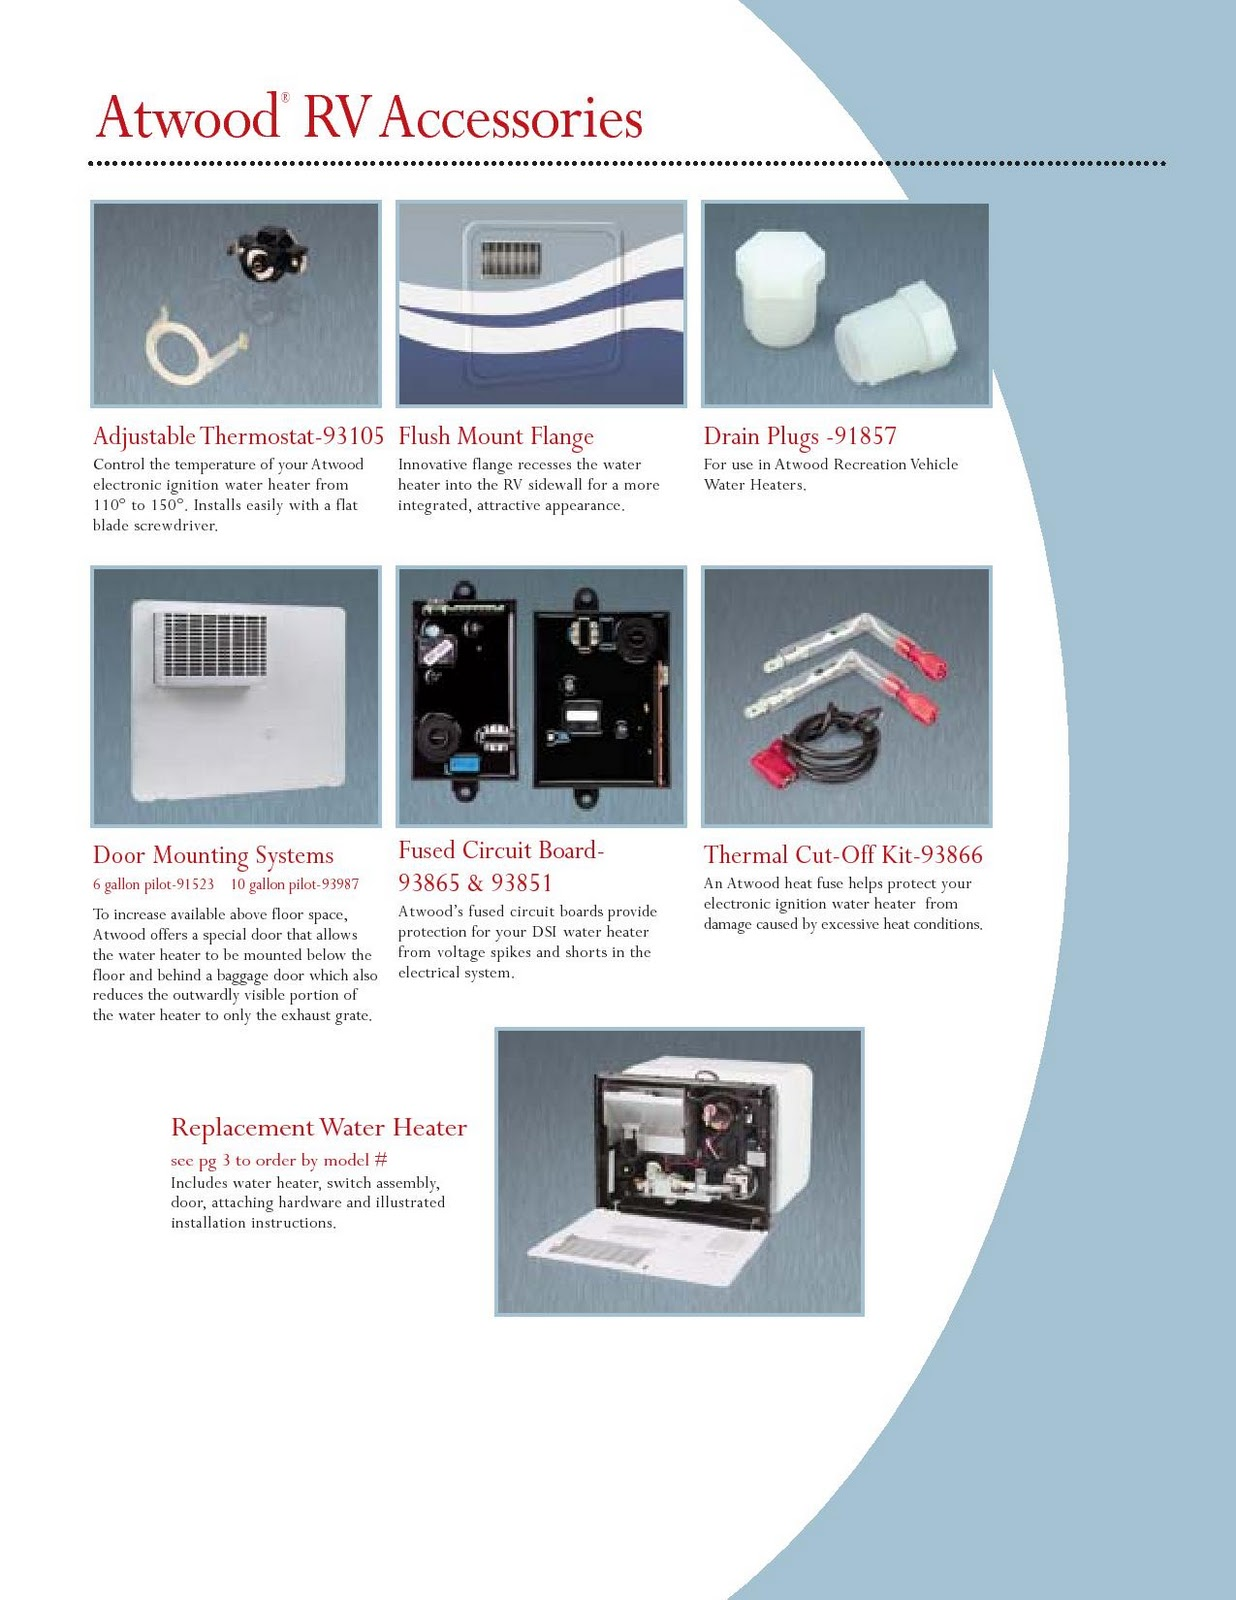 atwood water heater brochure [ 1236 x 1600 Pixel ]